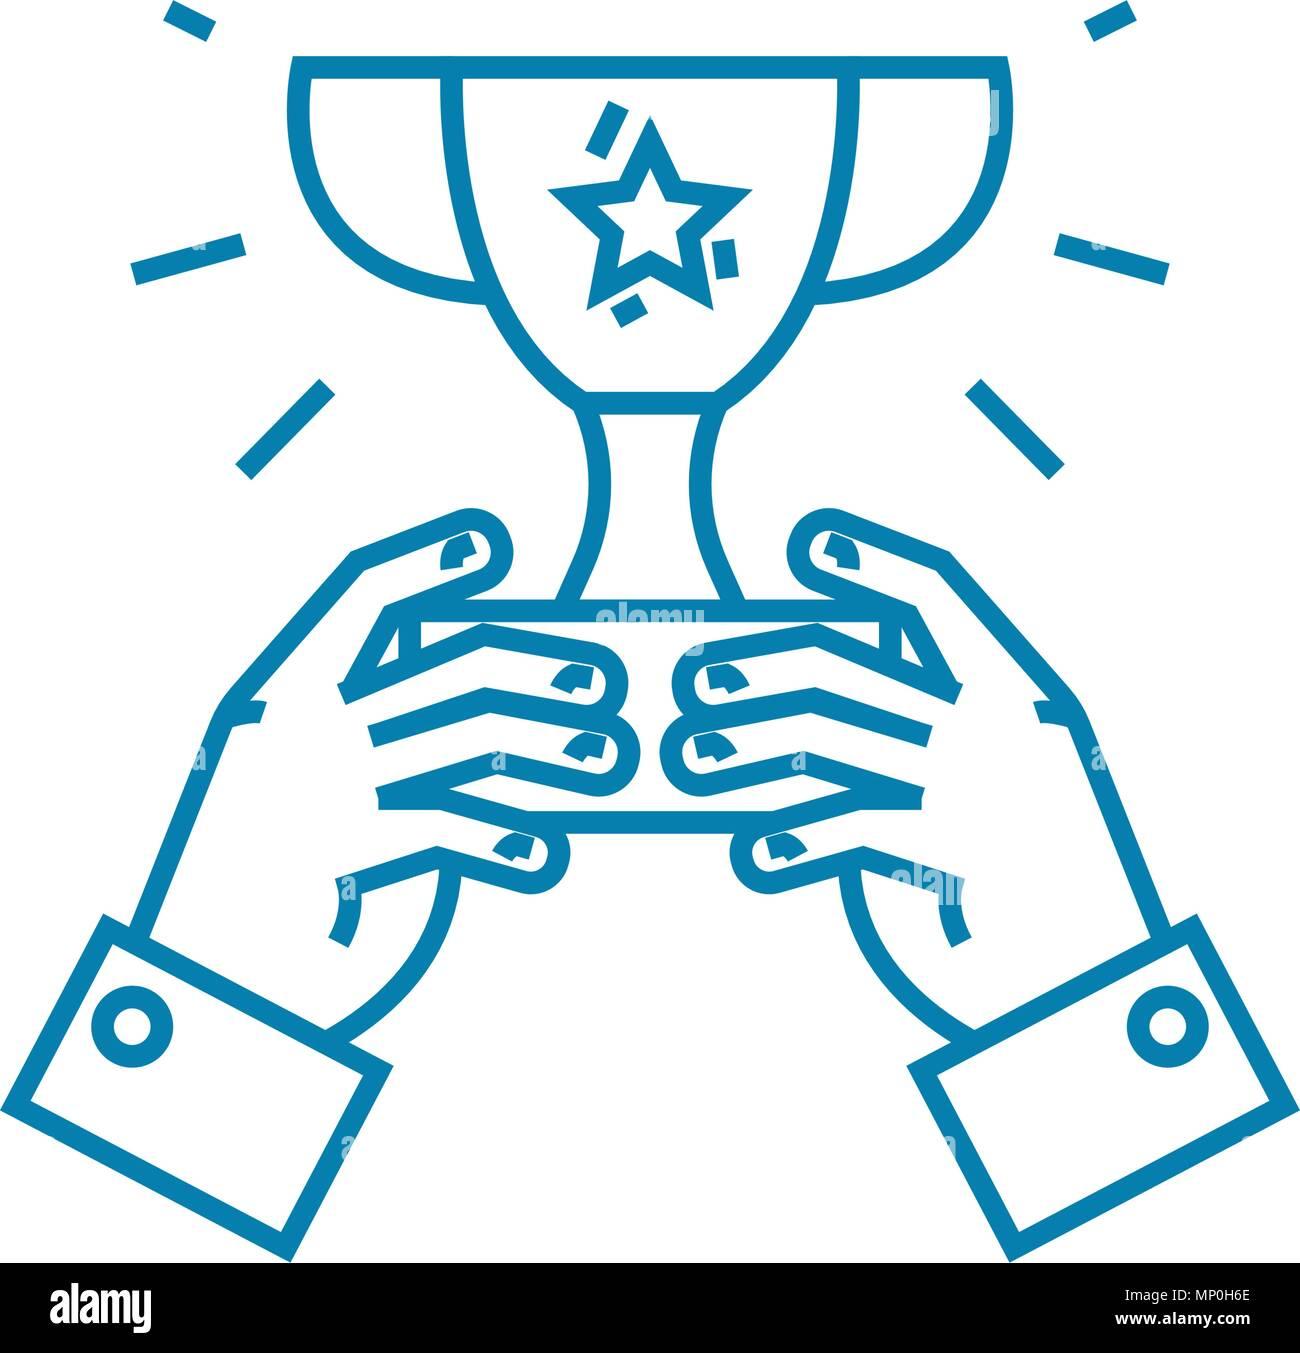 Common achievement linear icon concept. Common achievement line vector sign, symbol, illustration. - Stock Image